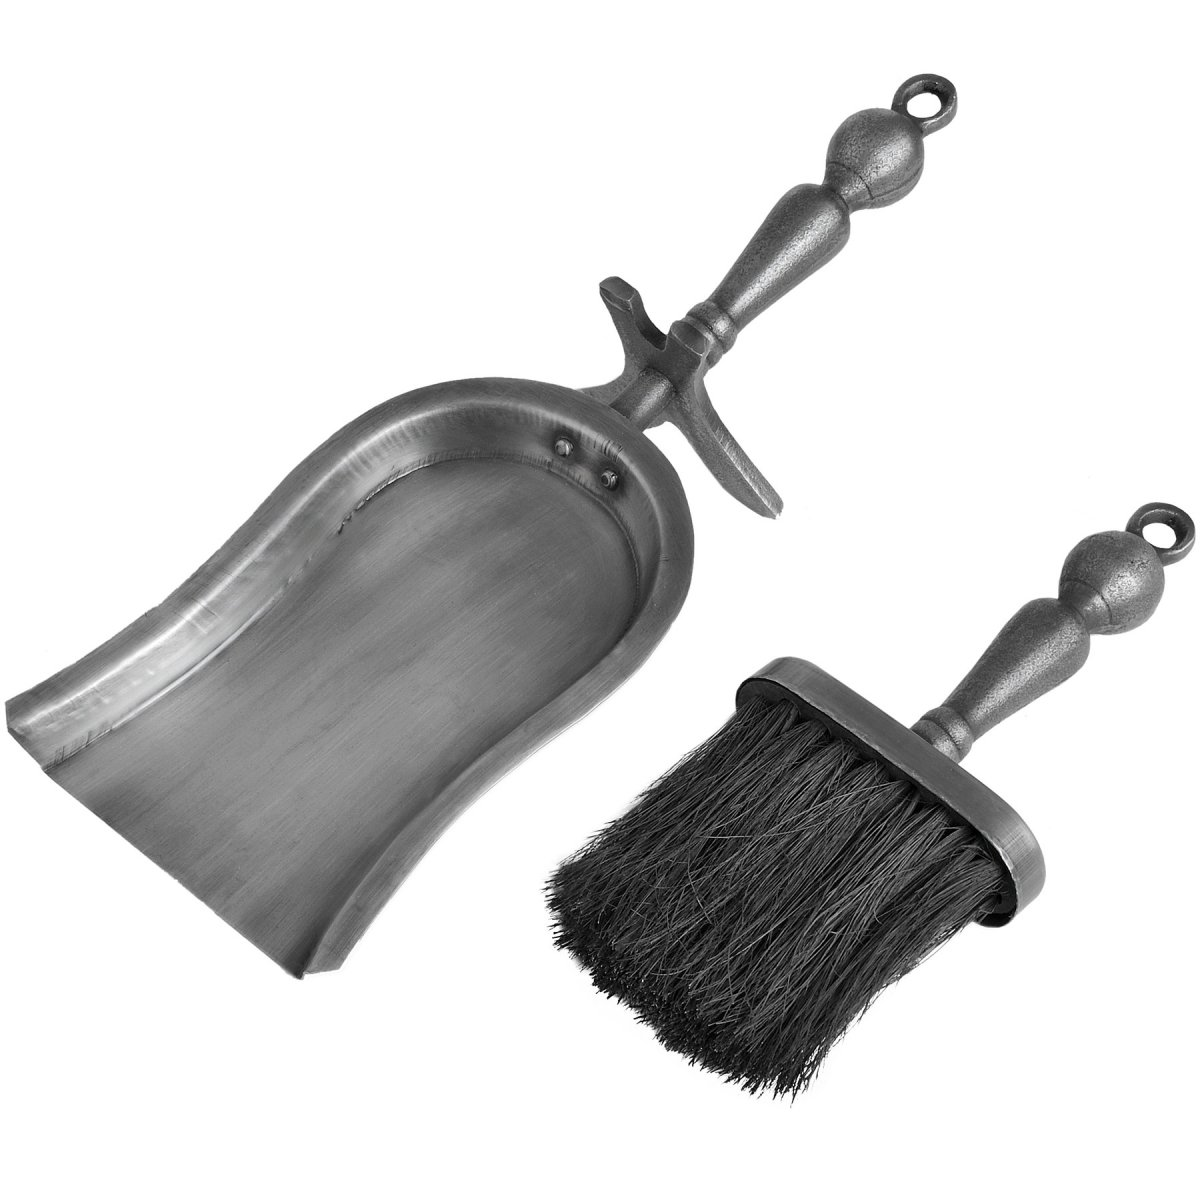 silver hearth tidy set shovel brush set swanky interiors rh swankyinteriors co uk